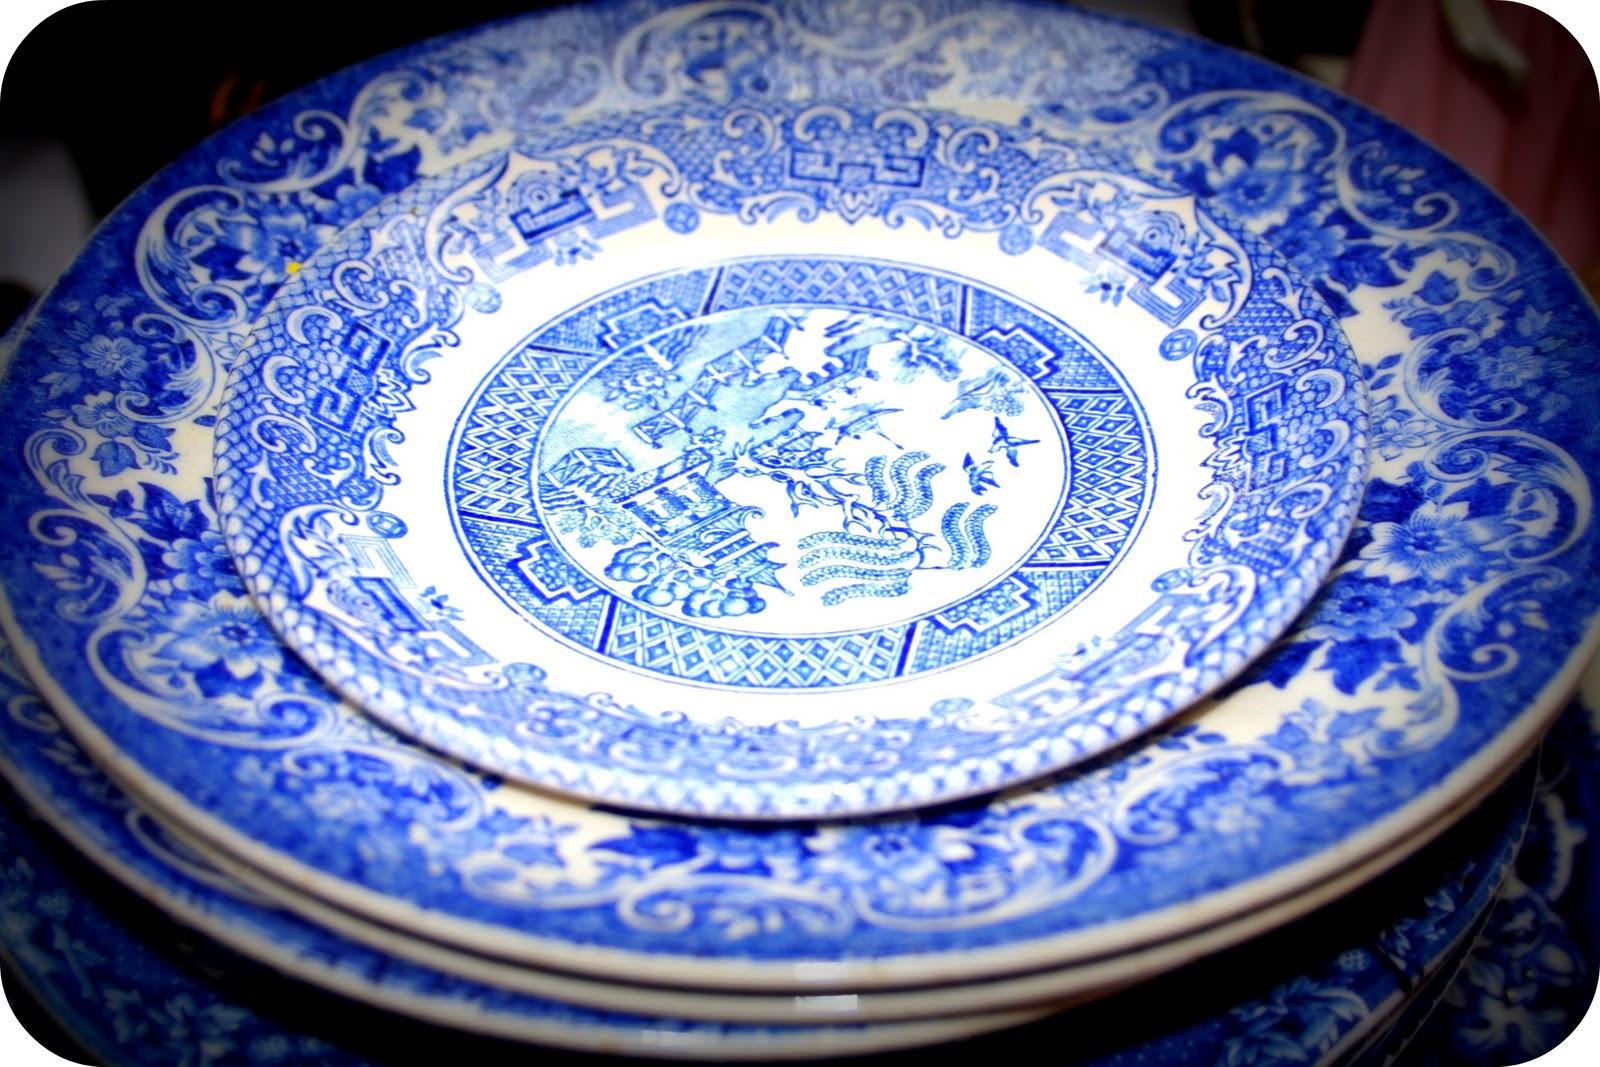 Old China Patterns old china patterns | patterns gallery